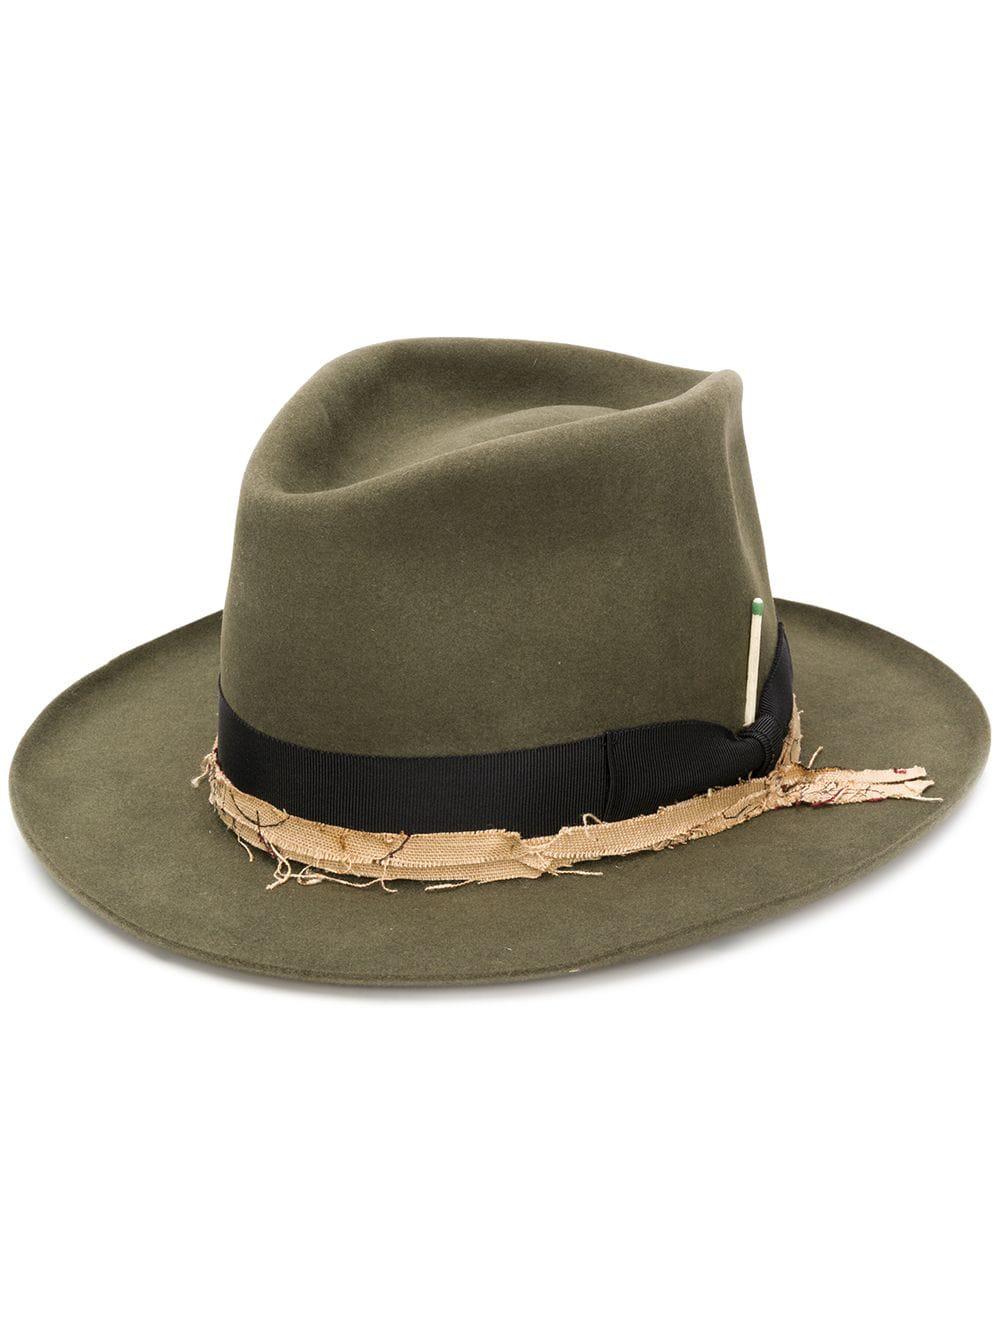 e8be104e69b1c Nick Fouquet Frayed Ribbon Fedora Hat - Green